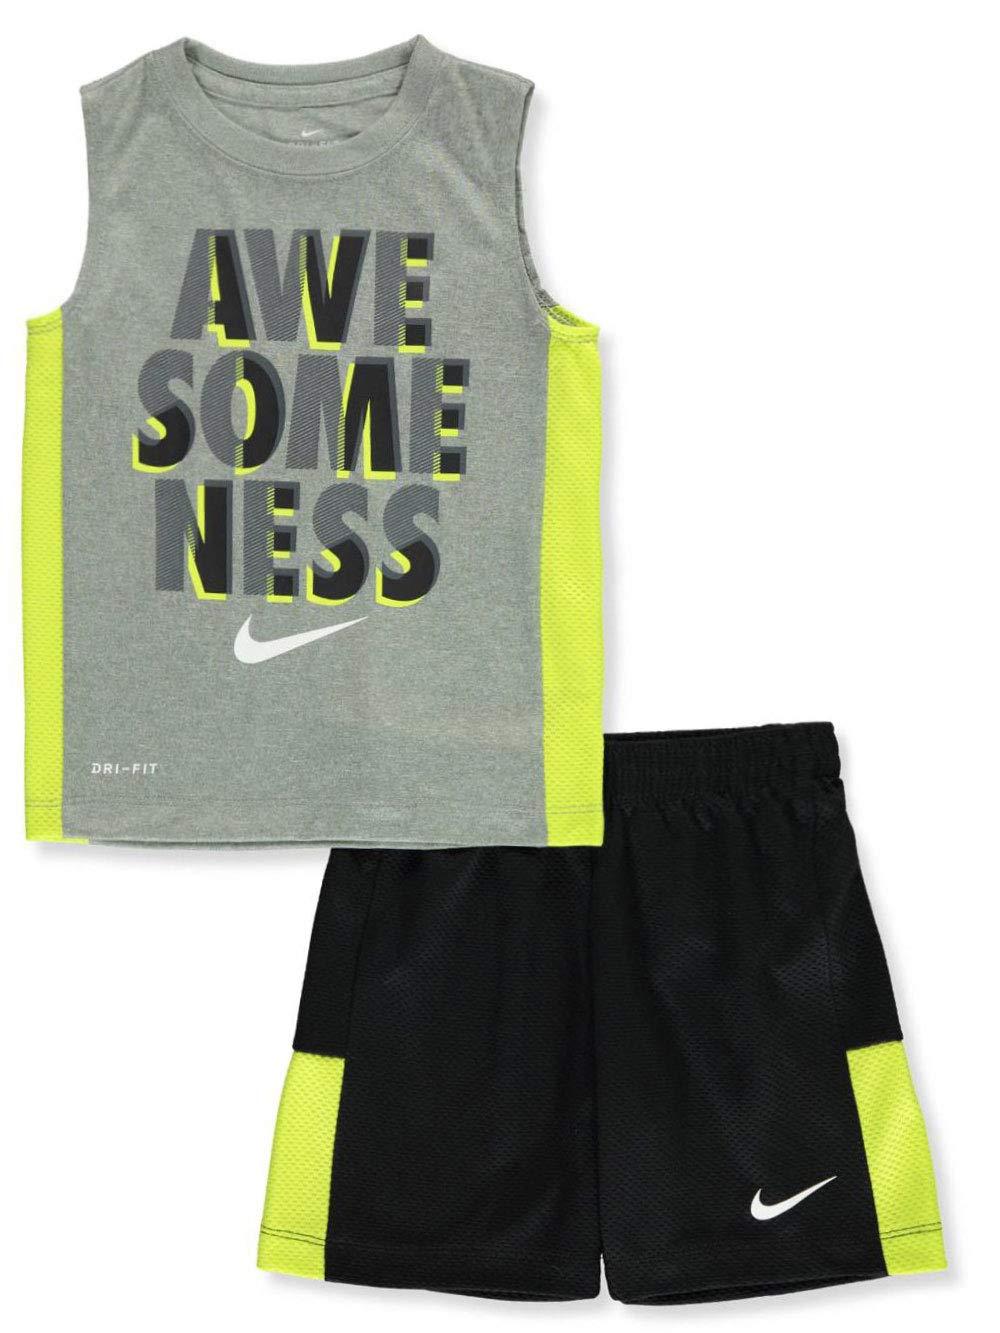 Nike Boys' 2-Piece Shorts Set Outfit - Black/Gray, 7